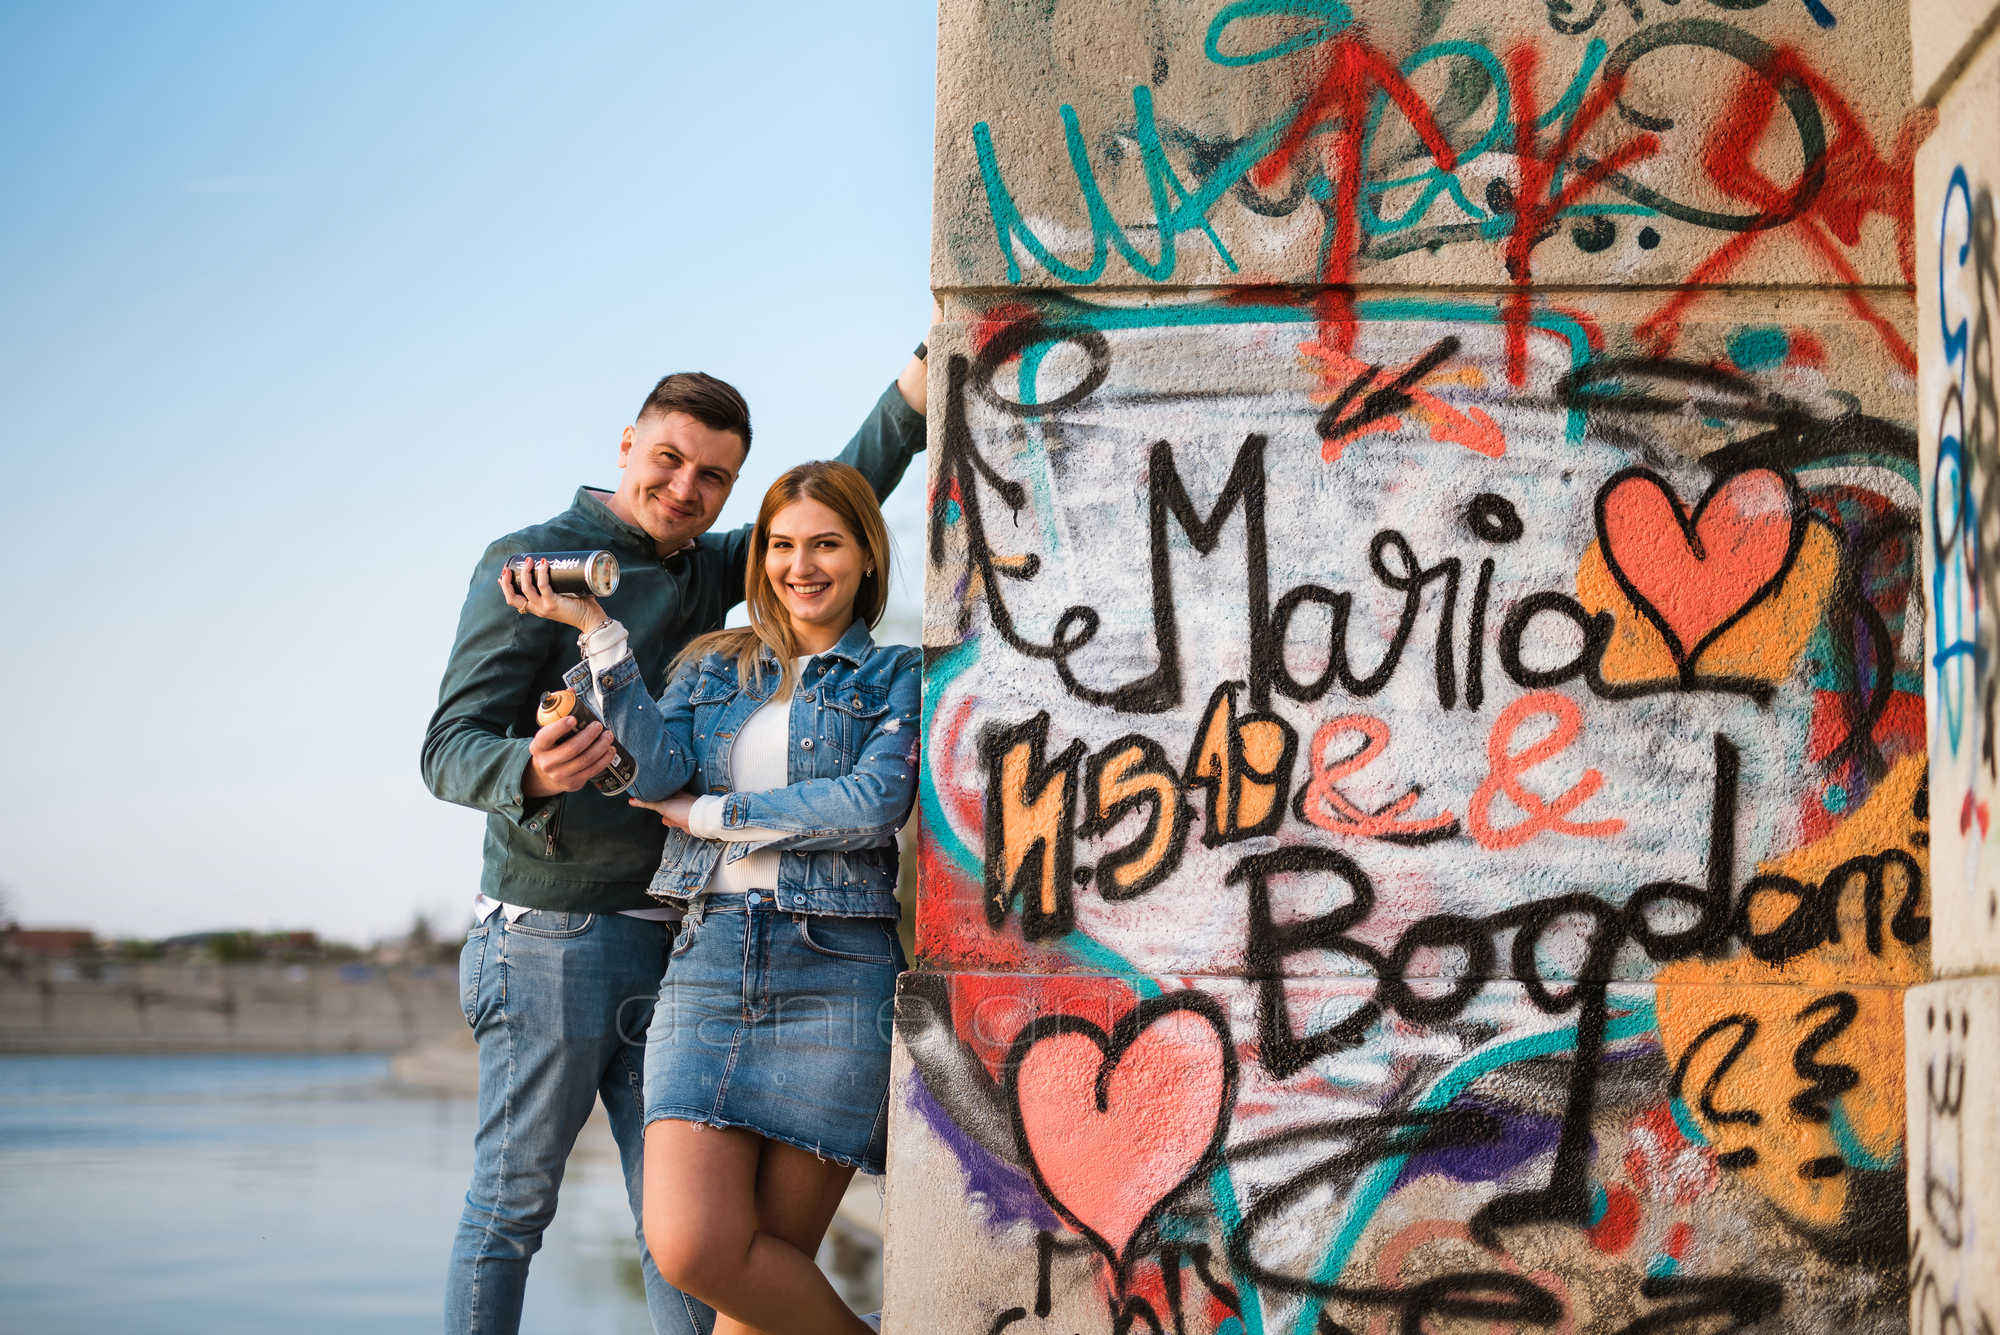 sedinta foto cuplu primavara graffiti lacul morii